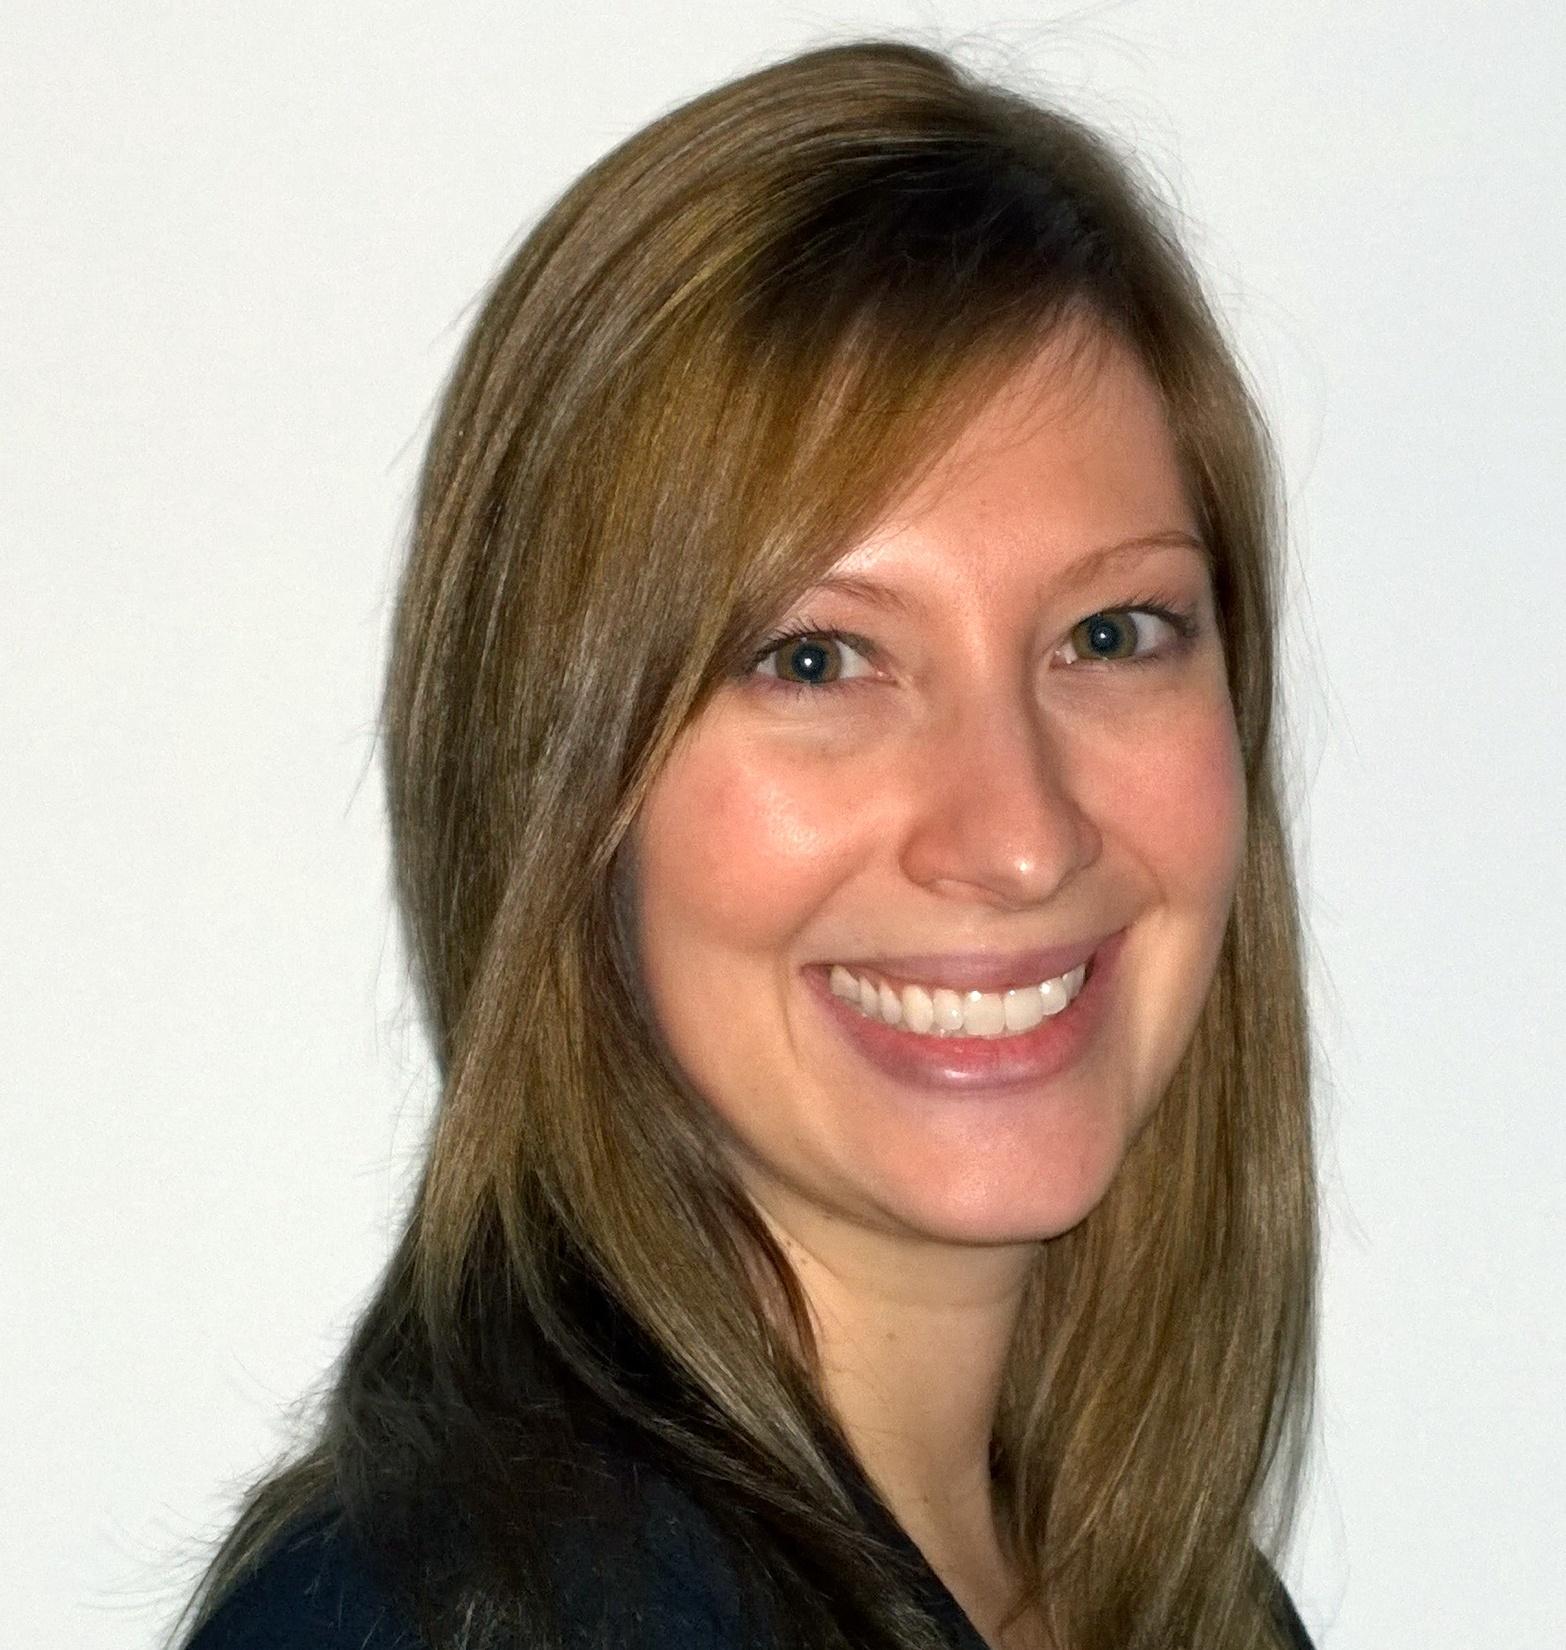 Ashlea Klahr - Clinical Psychology Intern - Psychiatry - Subject Matter Expert from Kolabtree